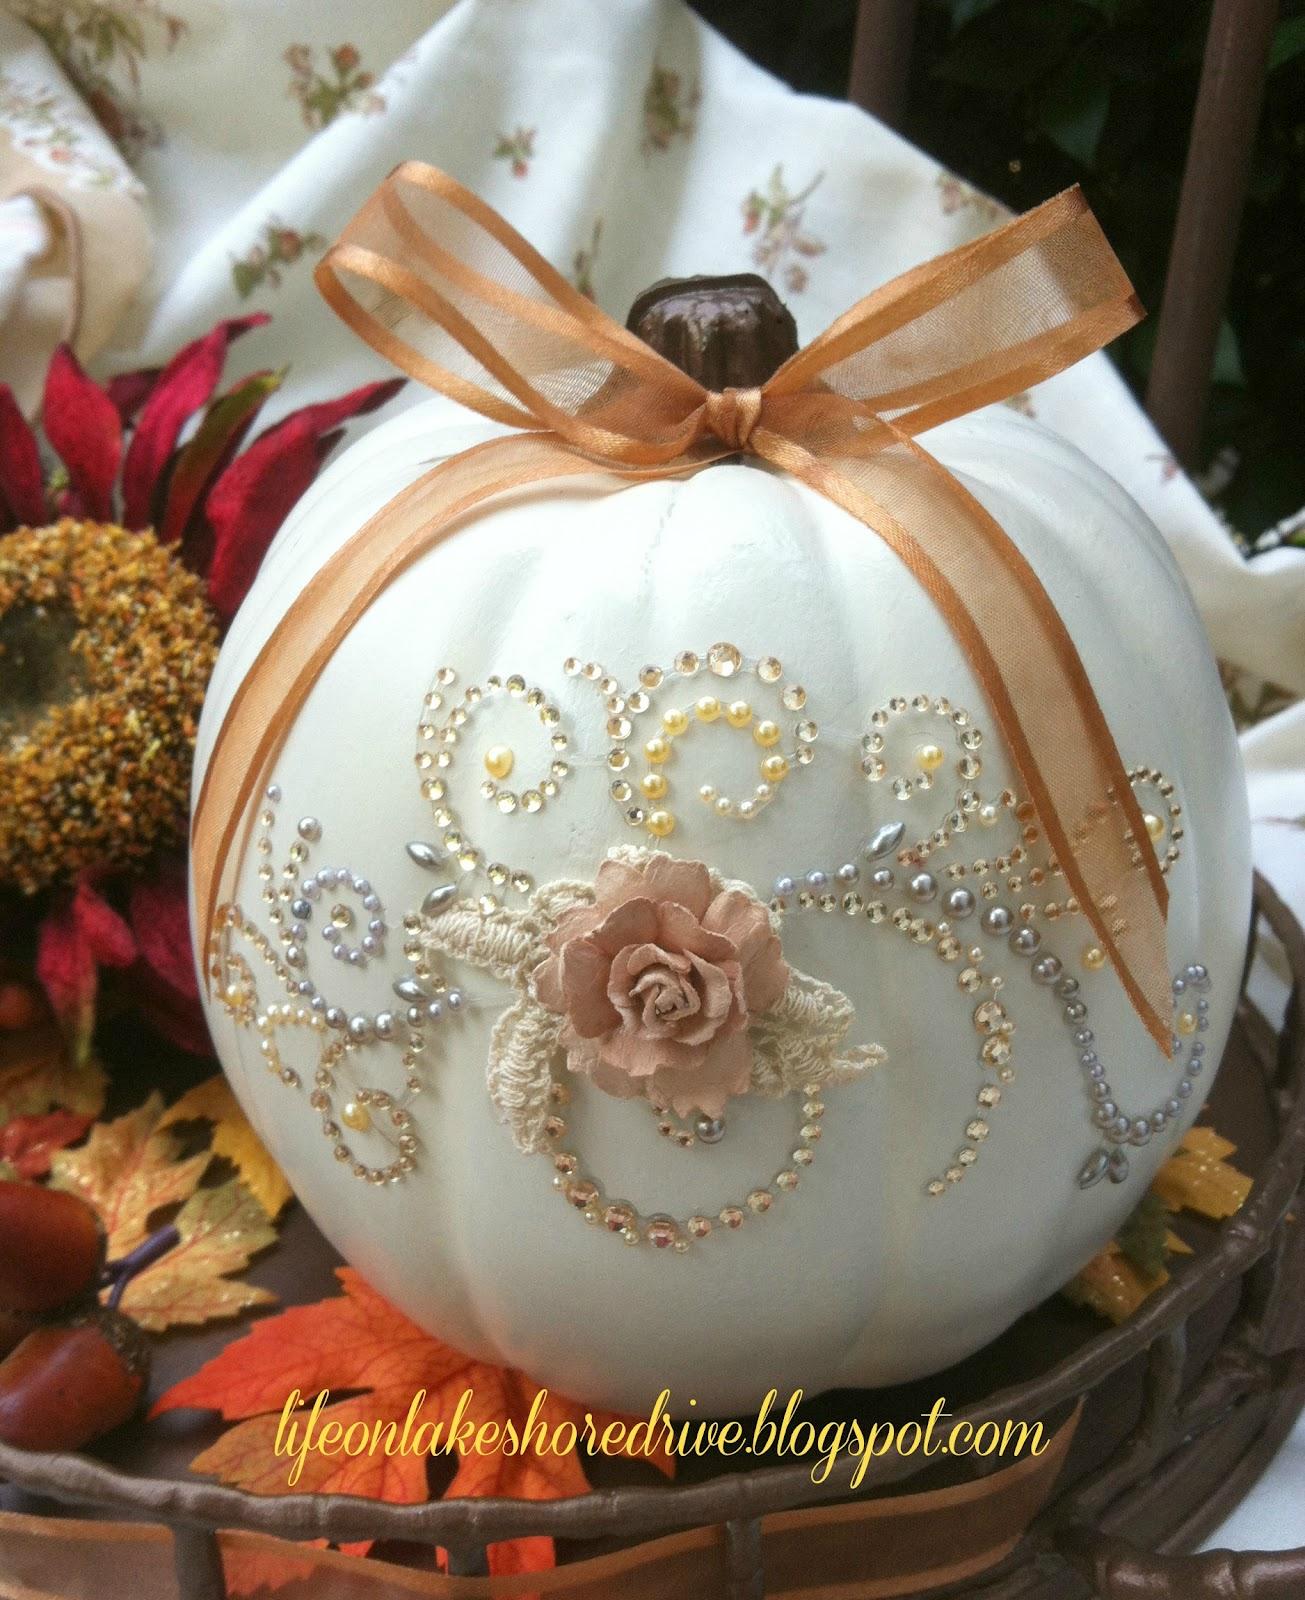 Pumpkin Glitz & Glitter |Life on Lakeshore Drive